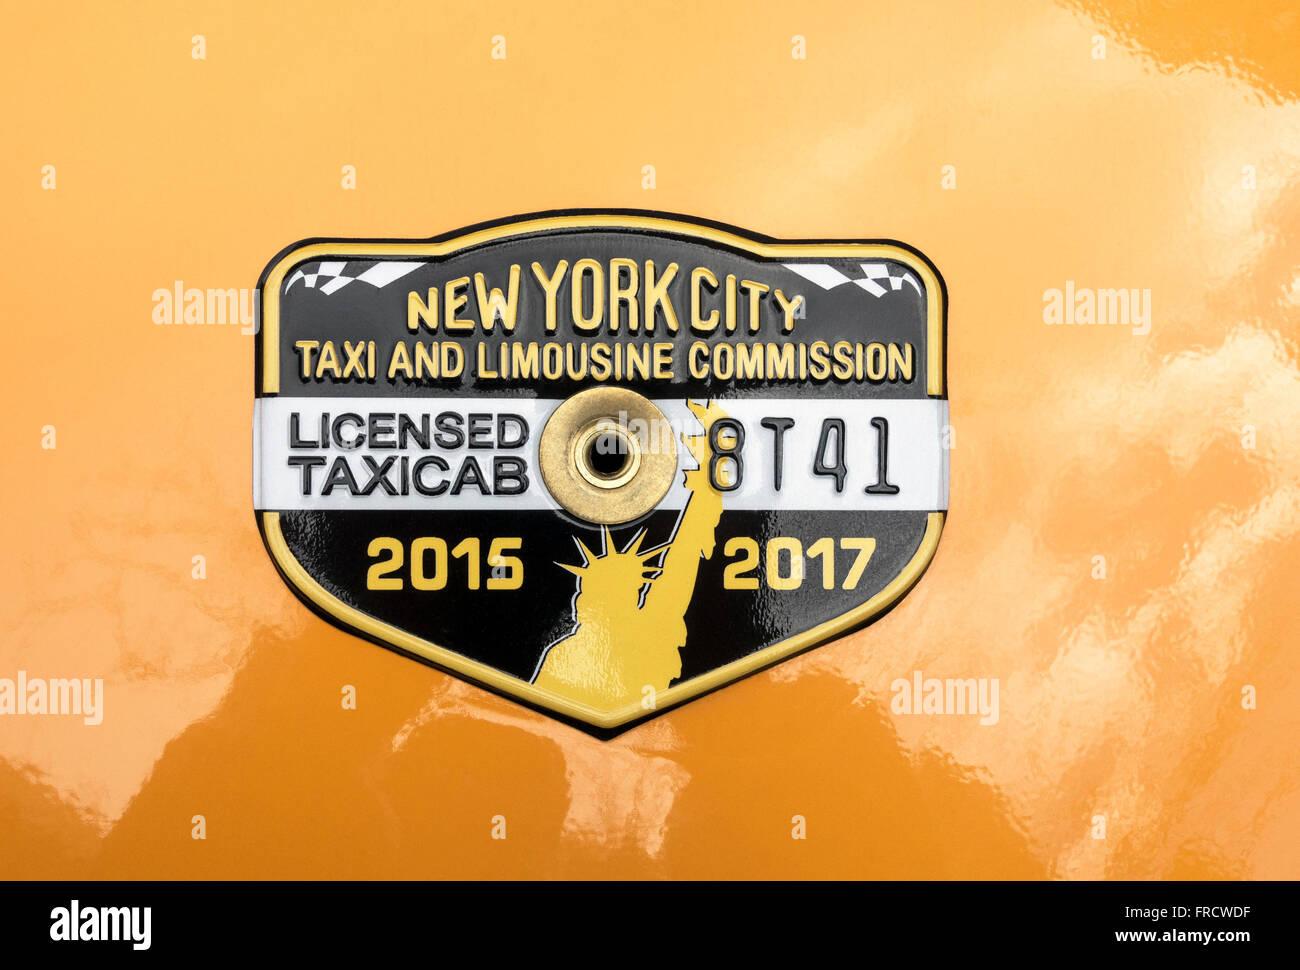 2015-2017 New York City taxi medallion - Stock Image